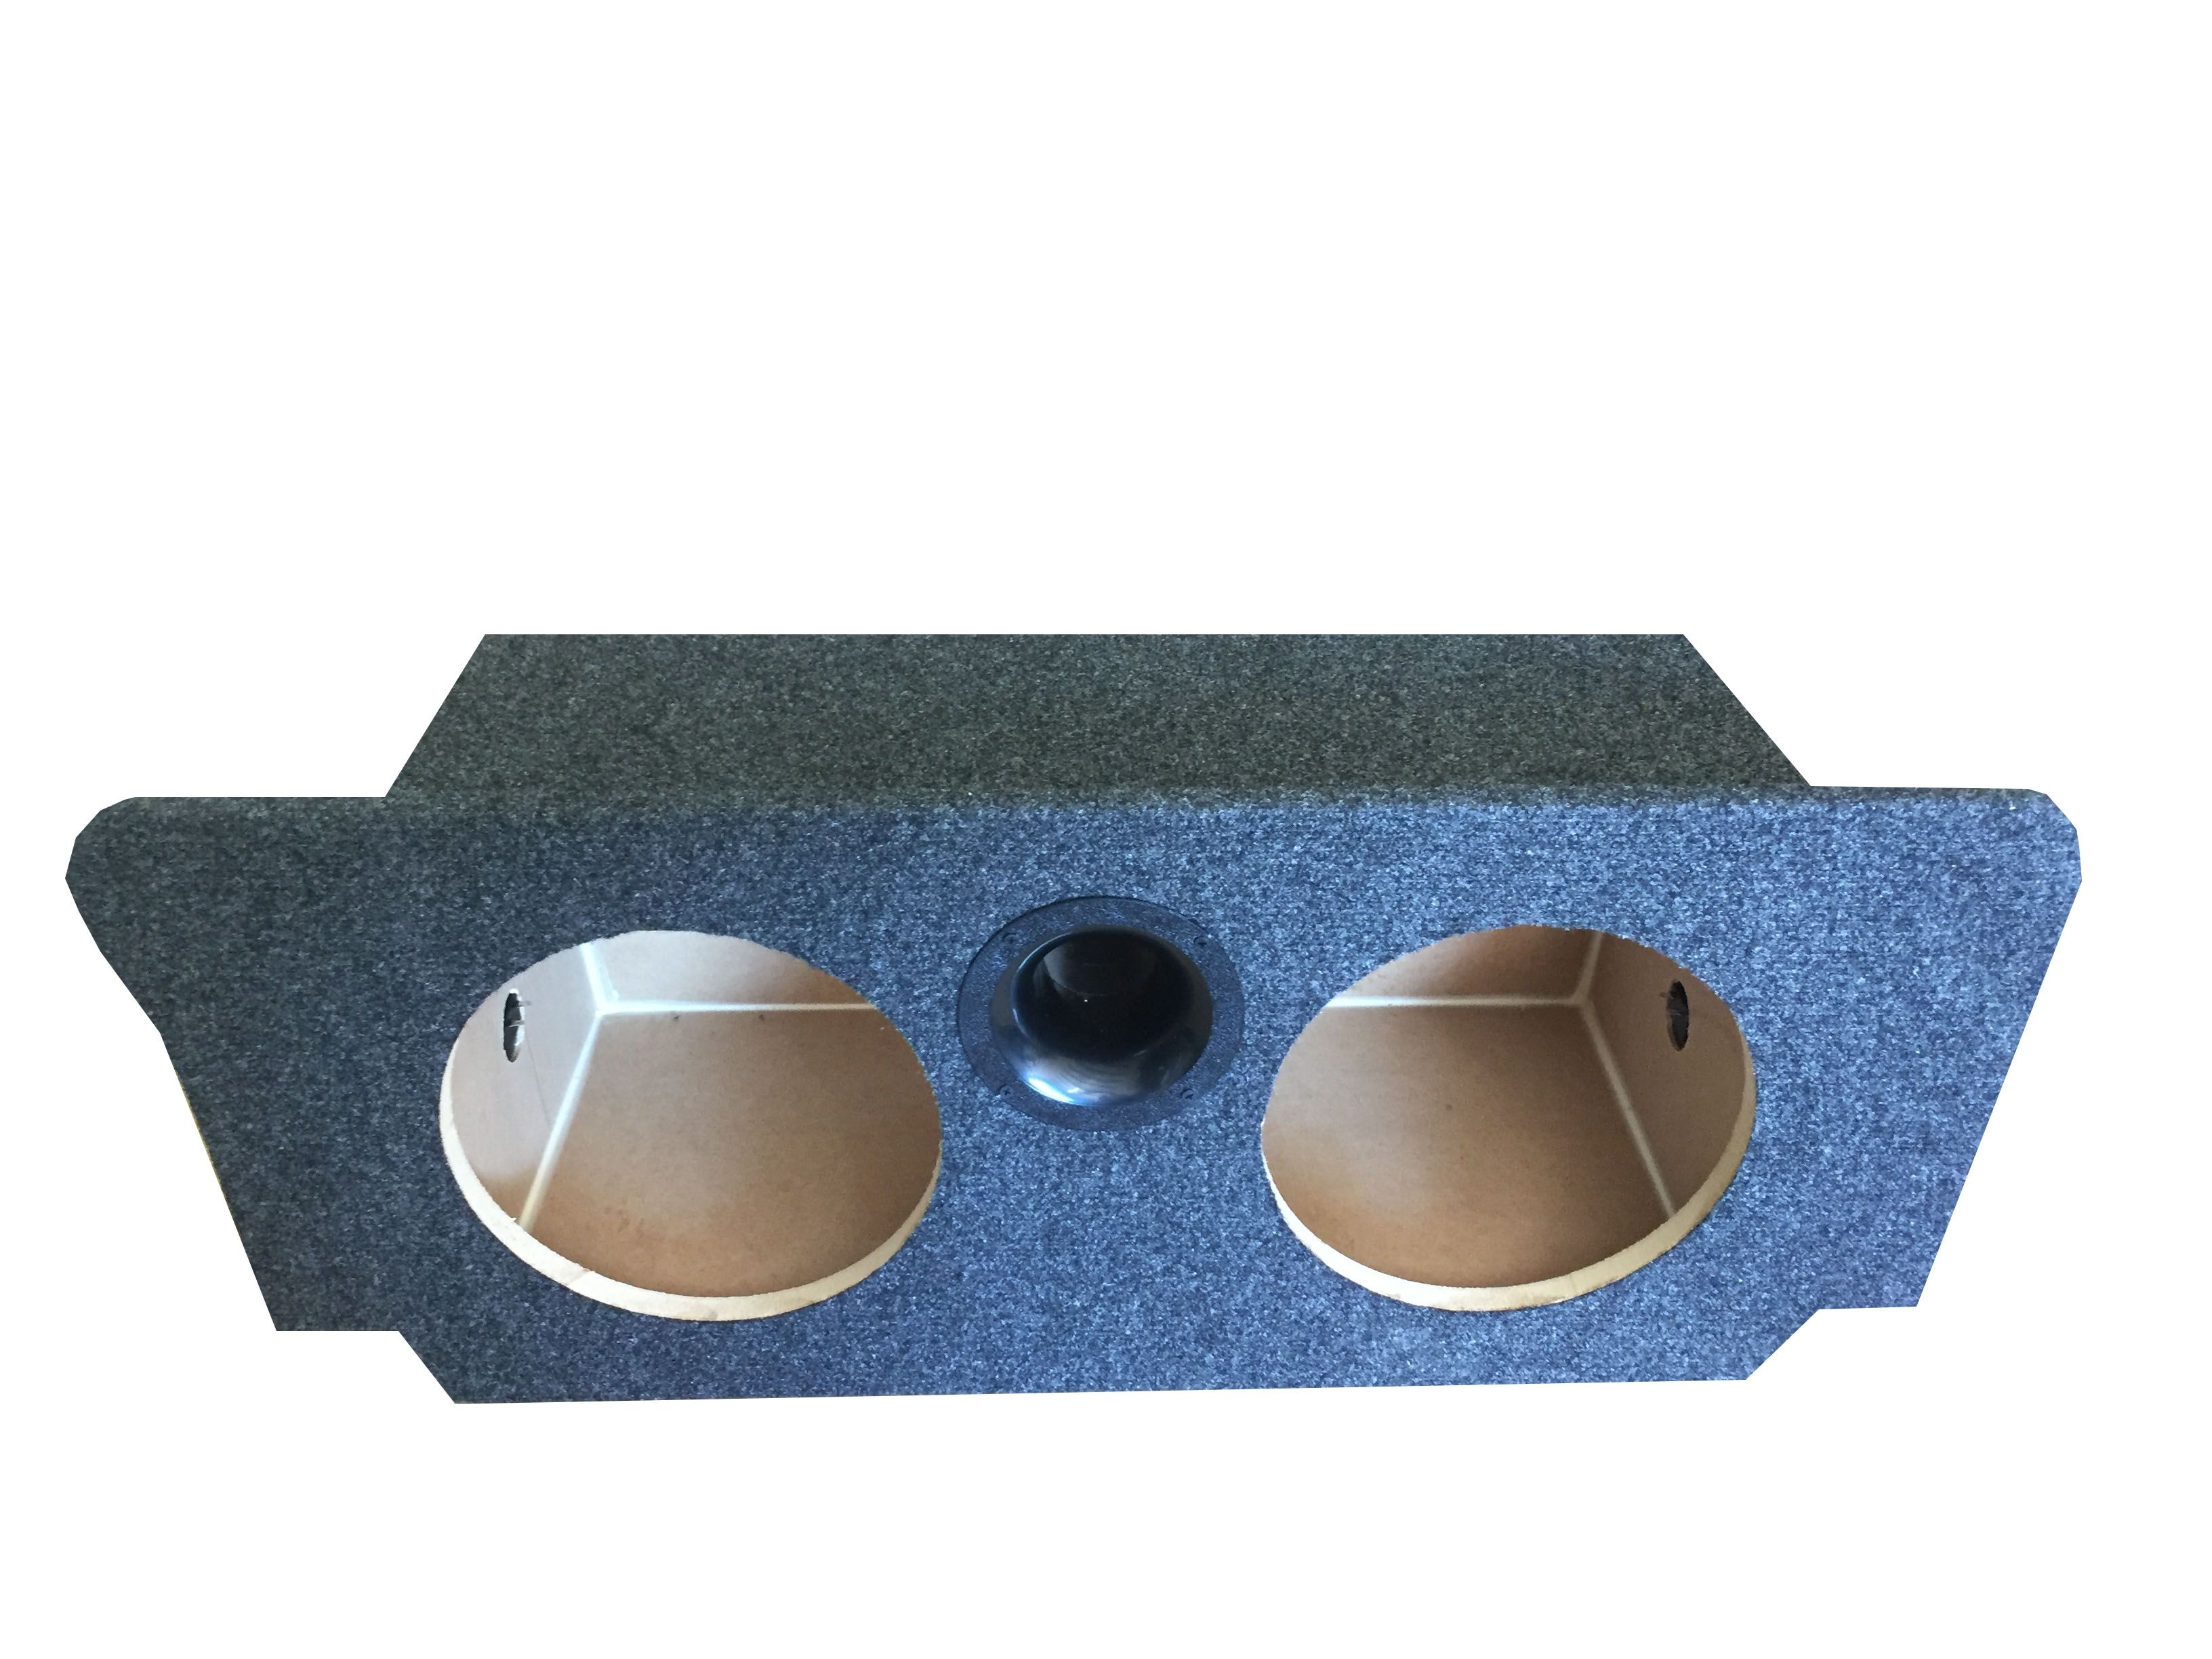 "VENTED 2005-2010 CHRYSLER 300 Subwoofer Sub Box Zenclosures 2-12/"" PORTED"